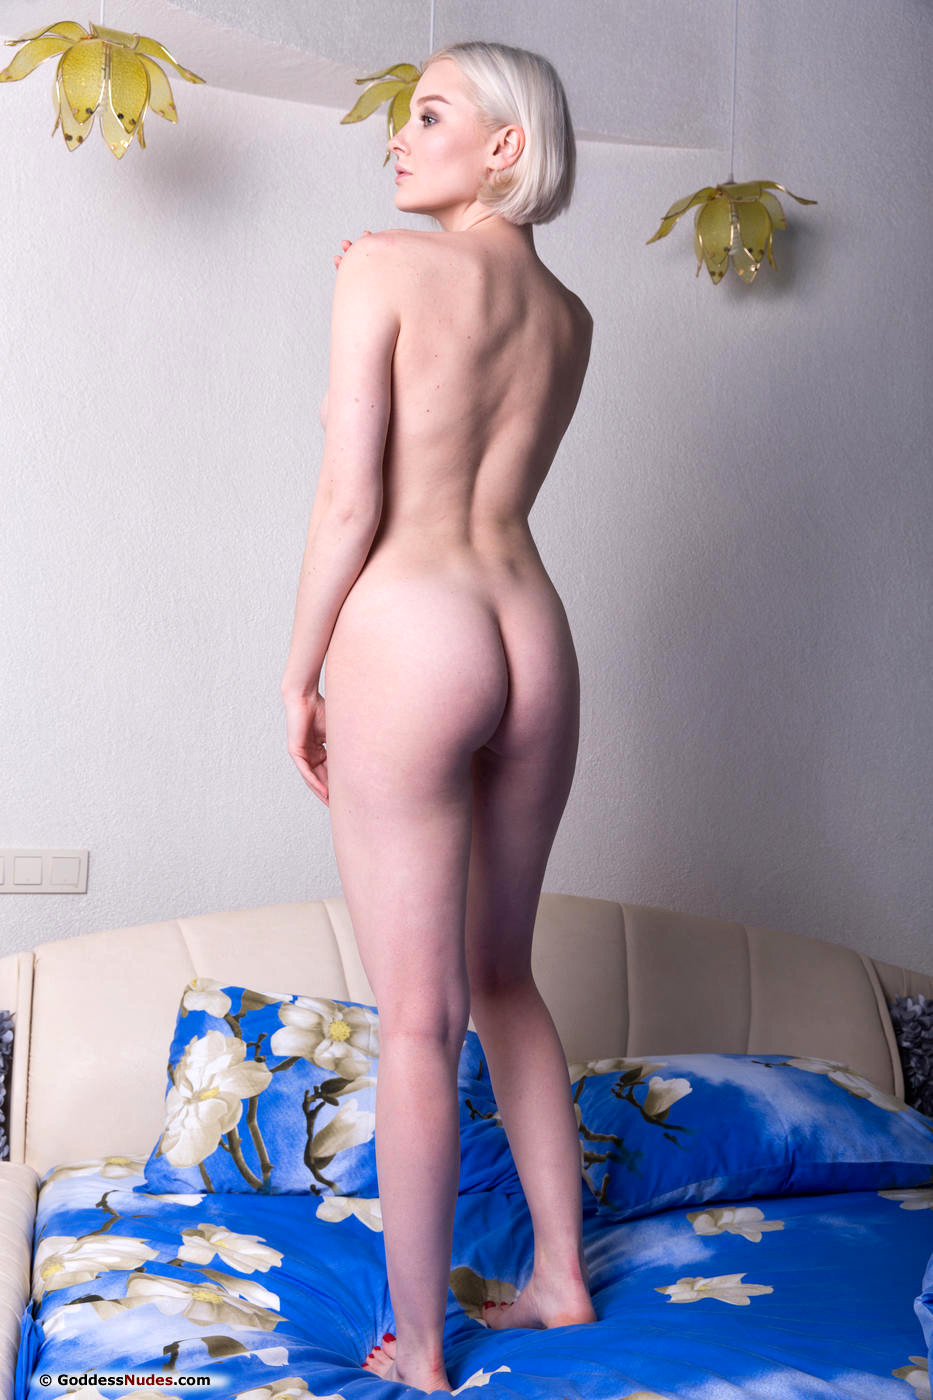 natalie goddess nudes